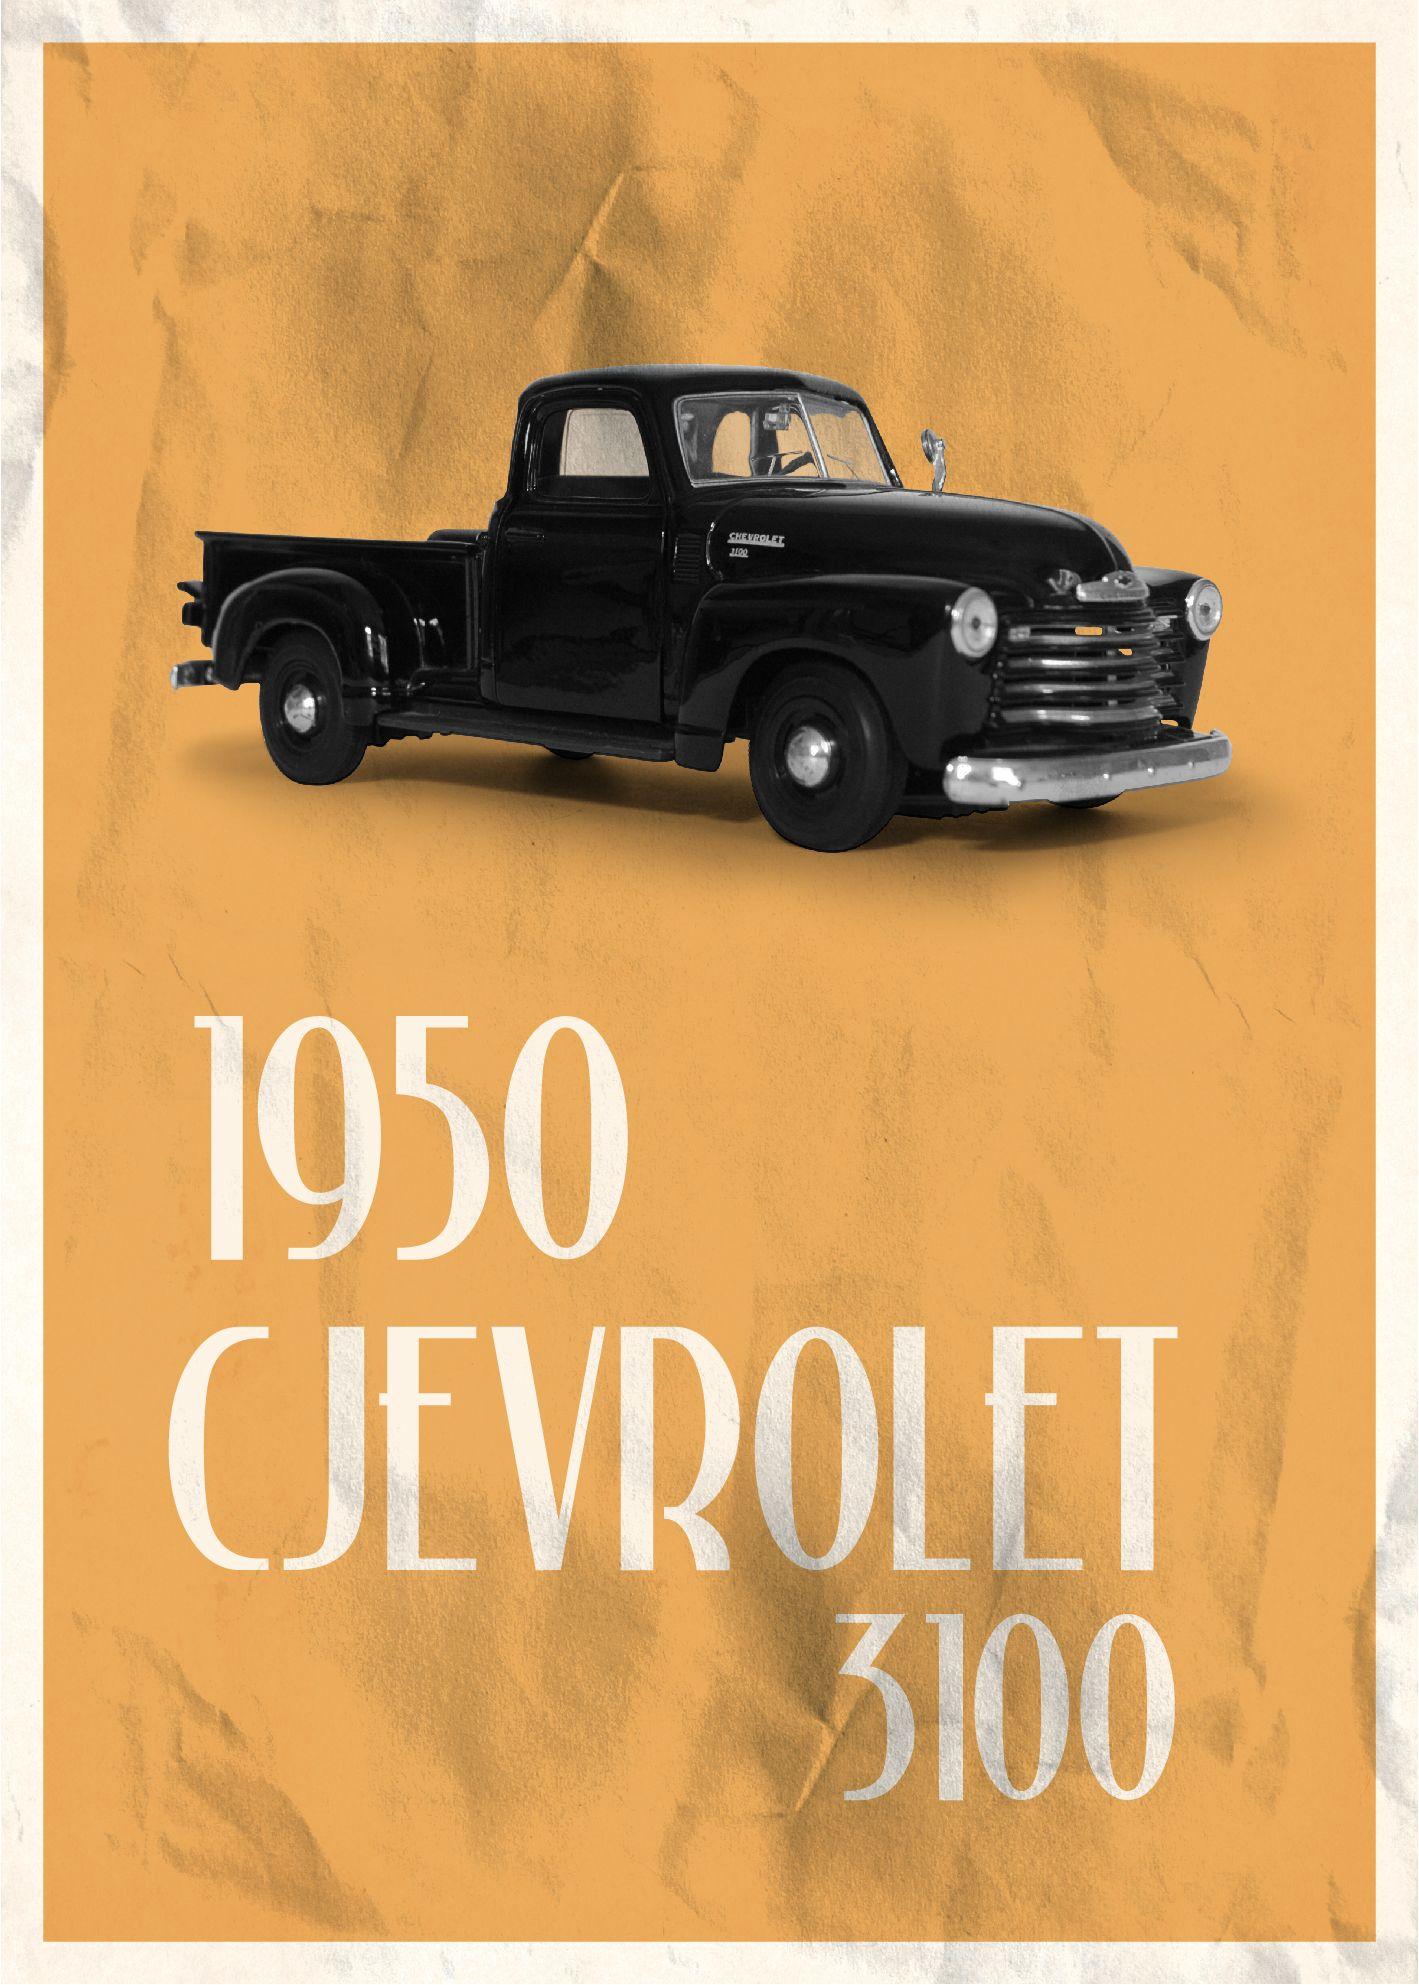 Melih Bertan 1950 Chevrolet 3100 Collection Cars Wallpaper Poster Toys Design Print Creative Art Poster Design Classic Collection Design